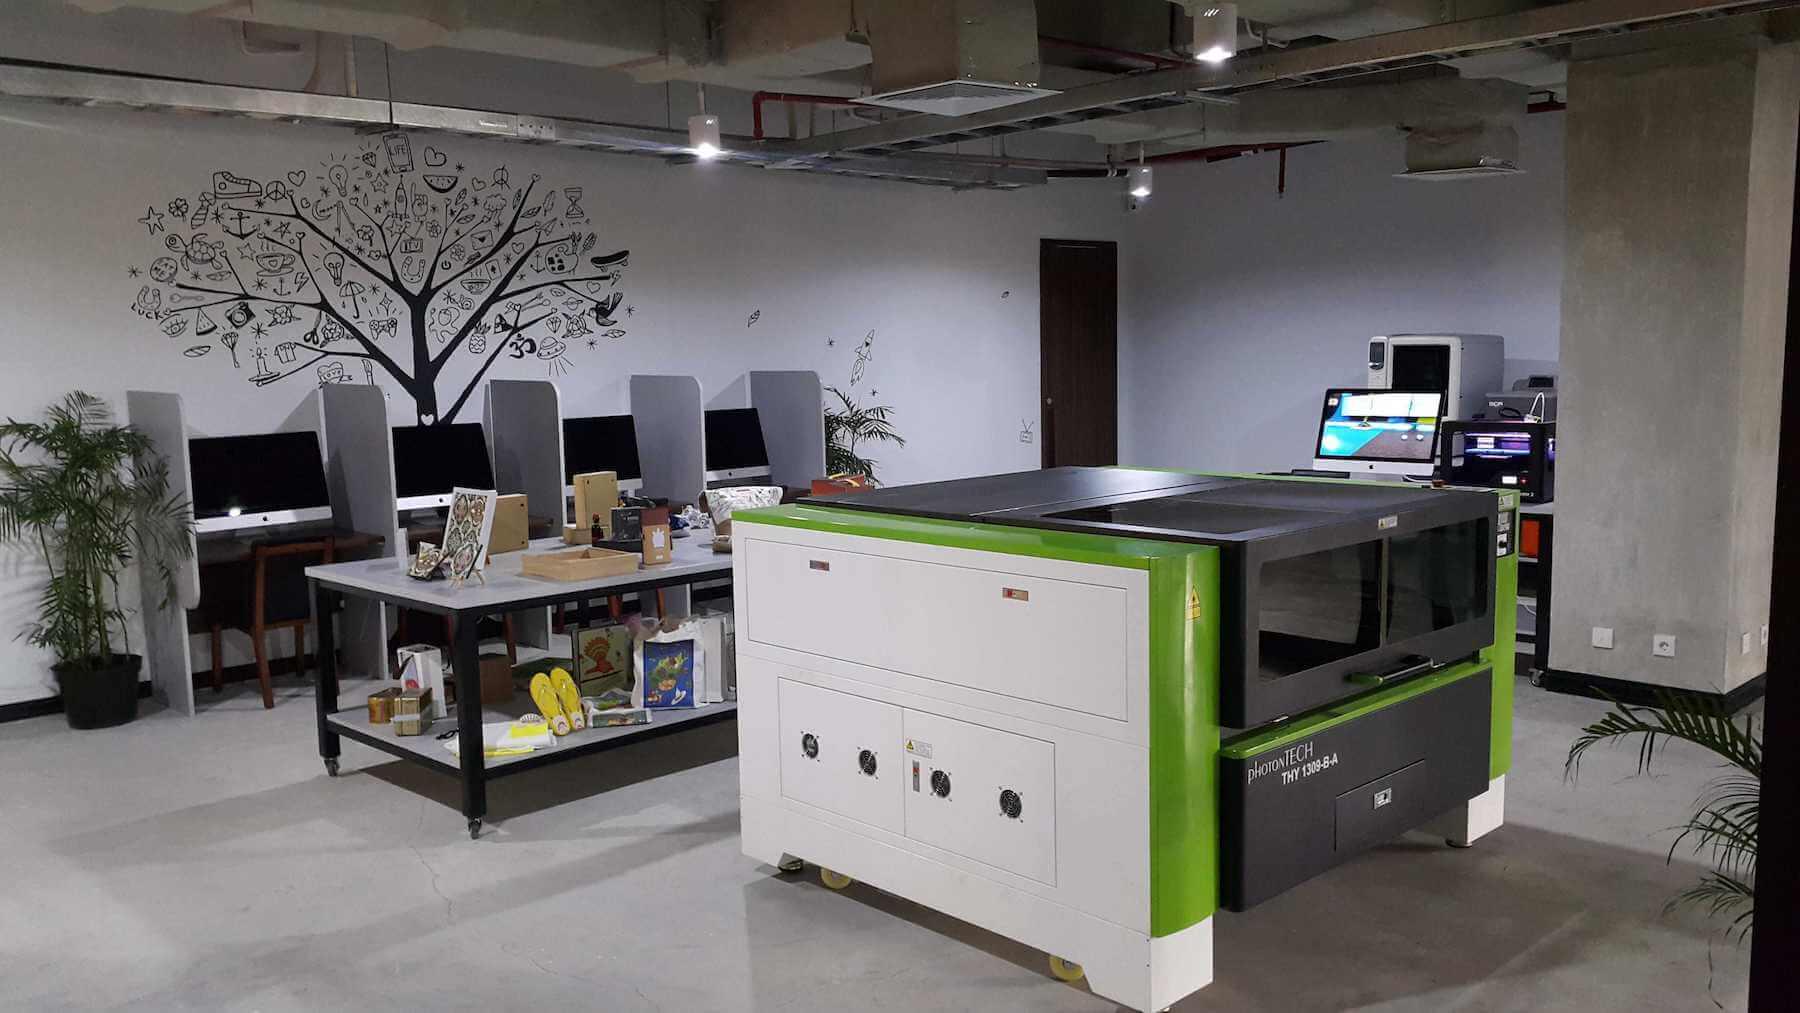 jakarta creative hub 4